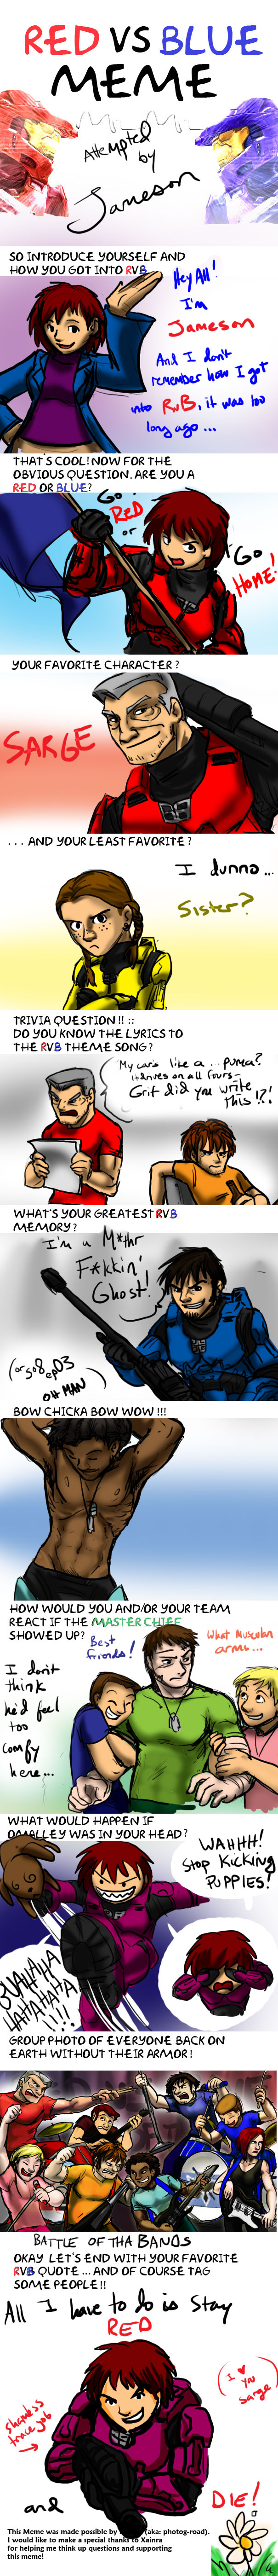 RvB meme by Jameson by jameson9101322